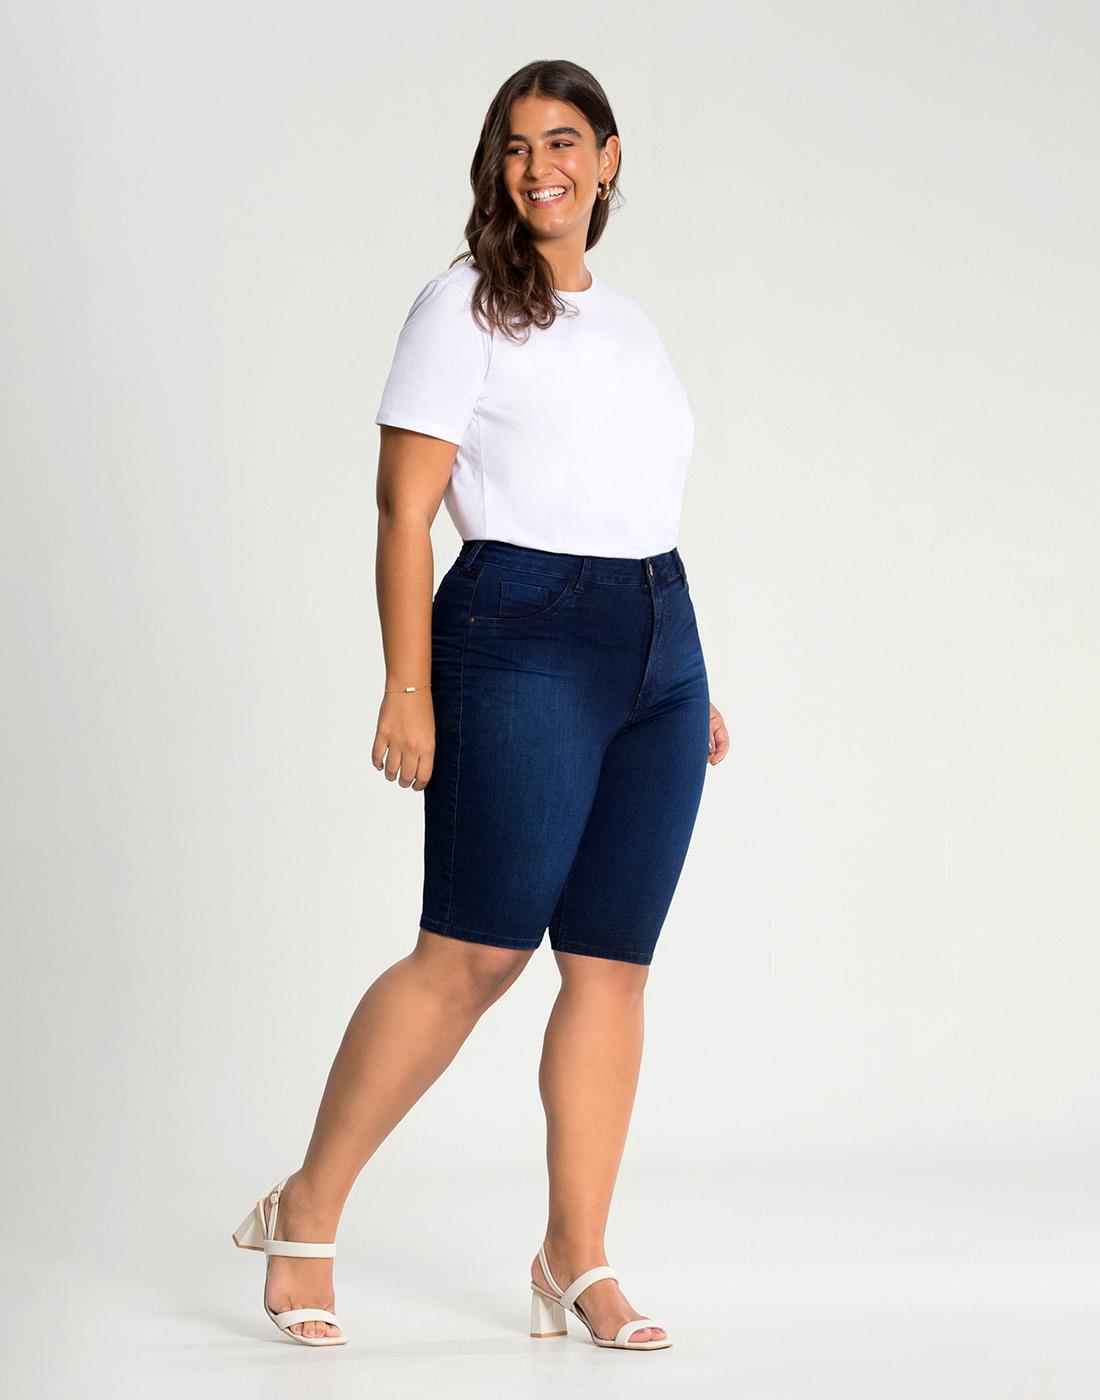 Bermuda Jeans Ciclista Cint. Media Fit For Me Lunender Mais Mulher